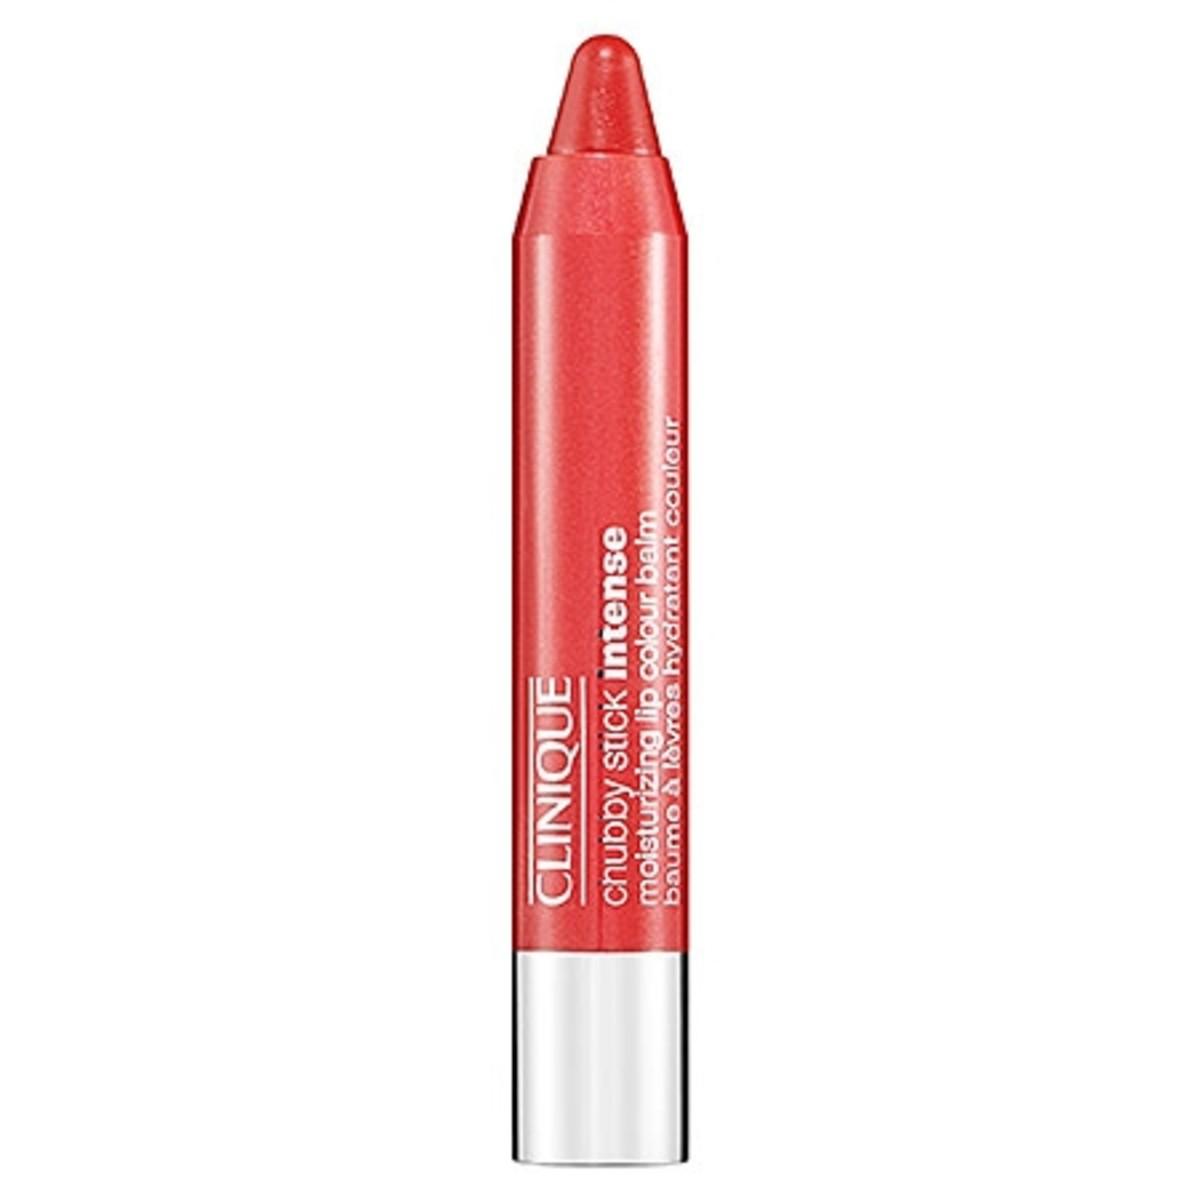 Clinique Chubby Stick Intense Moisturizing Lip Colour Balm in Heftiest Hibiscus